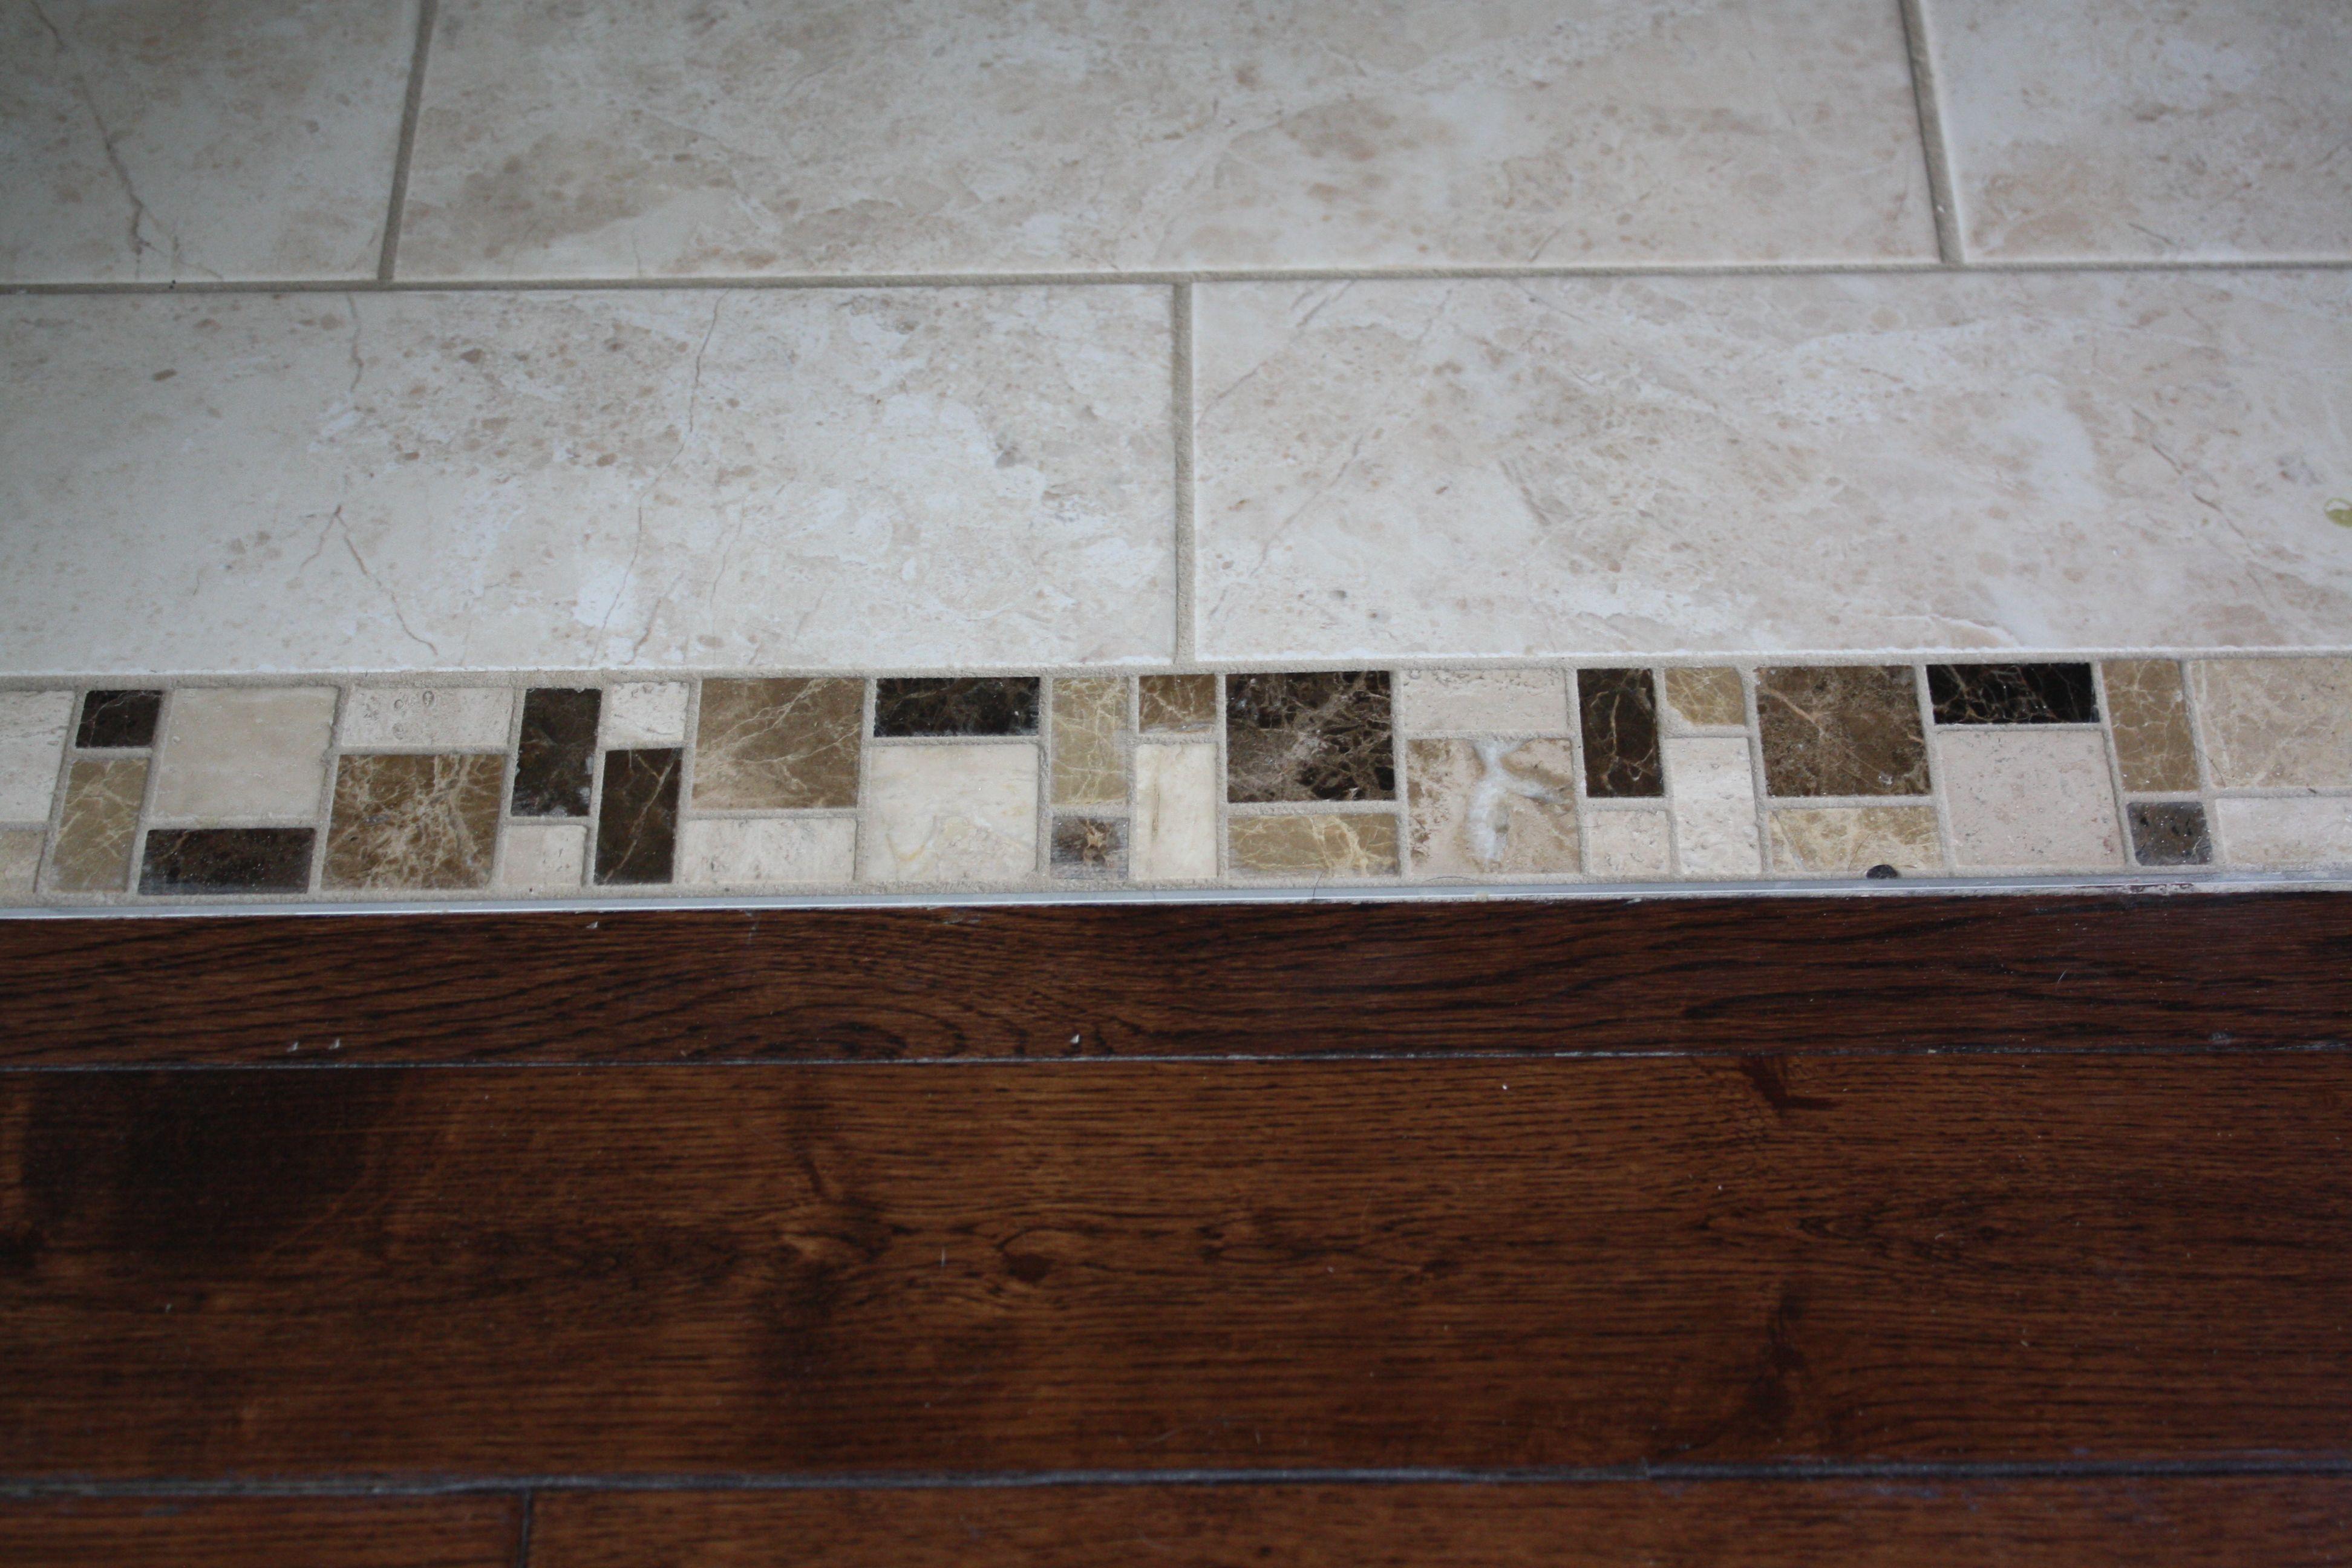 Guest Bathroom Tile Floor To Hallway Hardwood Transition Flooring Tile Floor Tile Bathroom